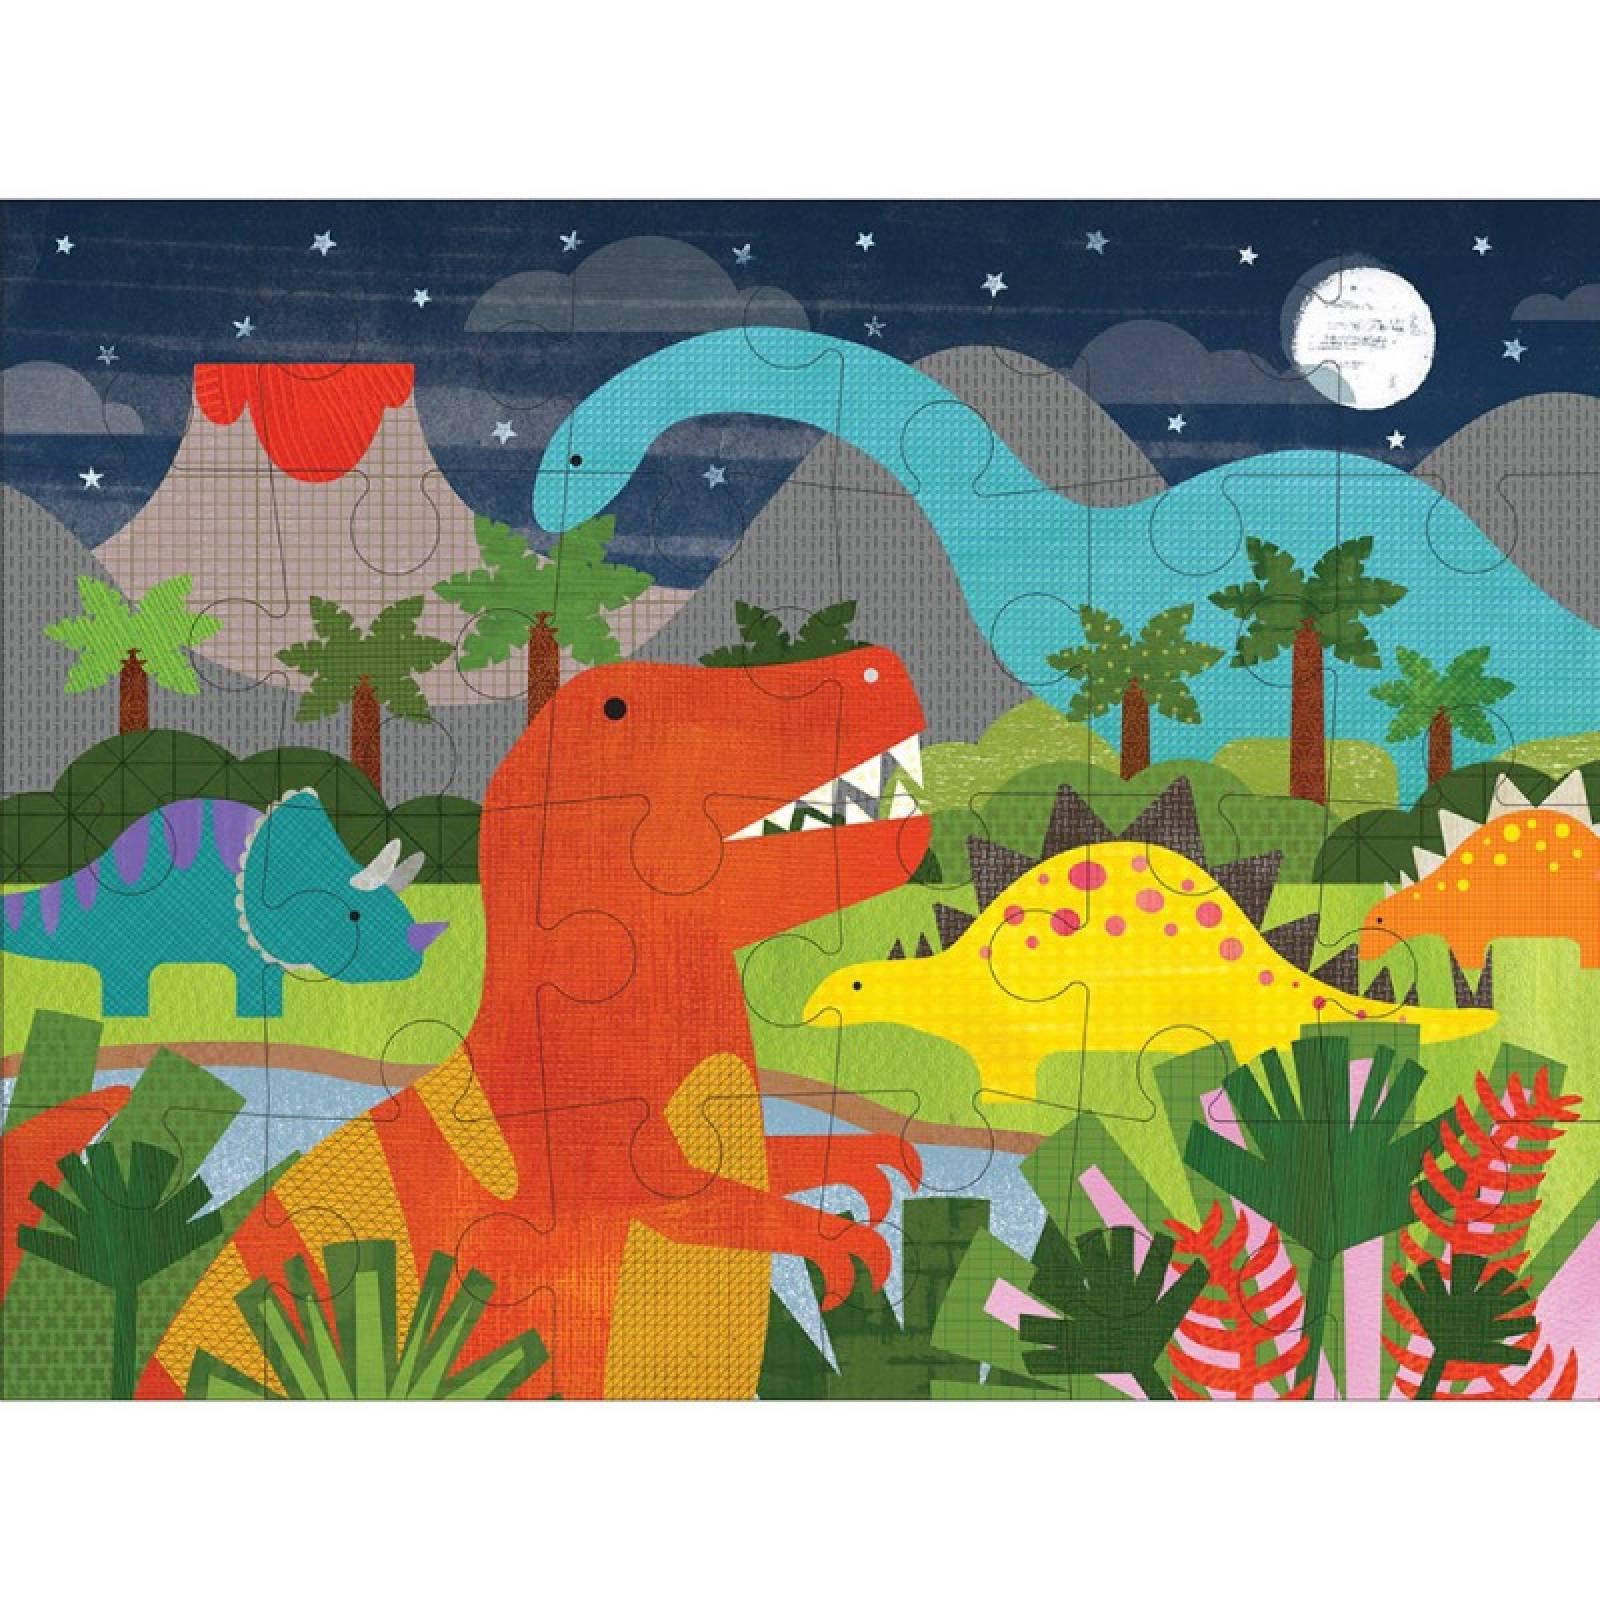 Dinosaur Kingdom Floor Puzzle 24pc 3+ thumbnails